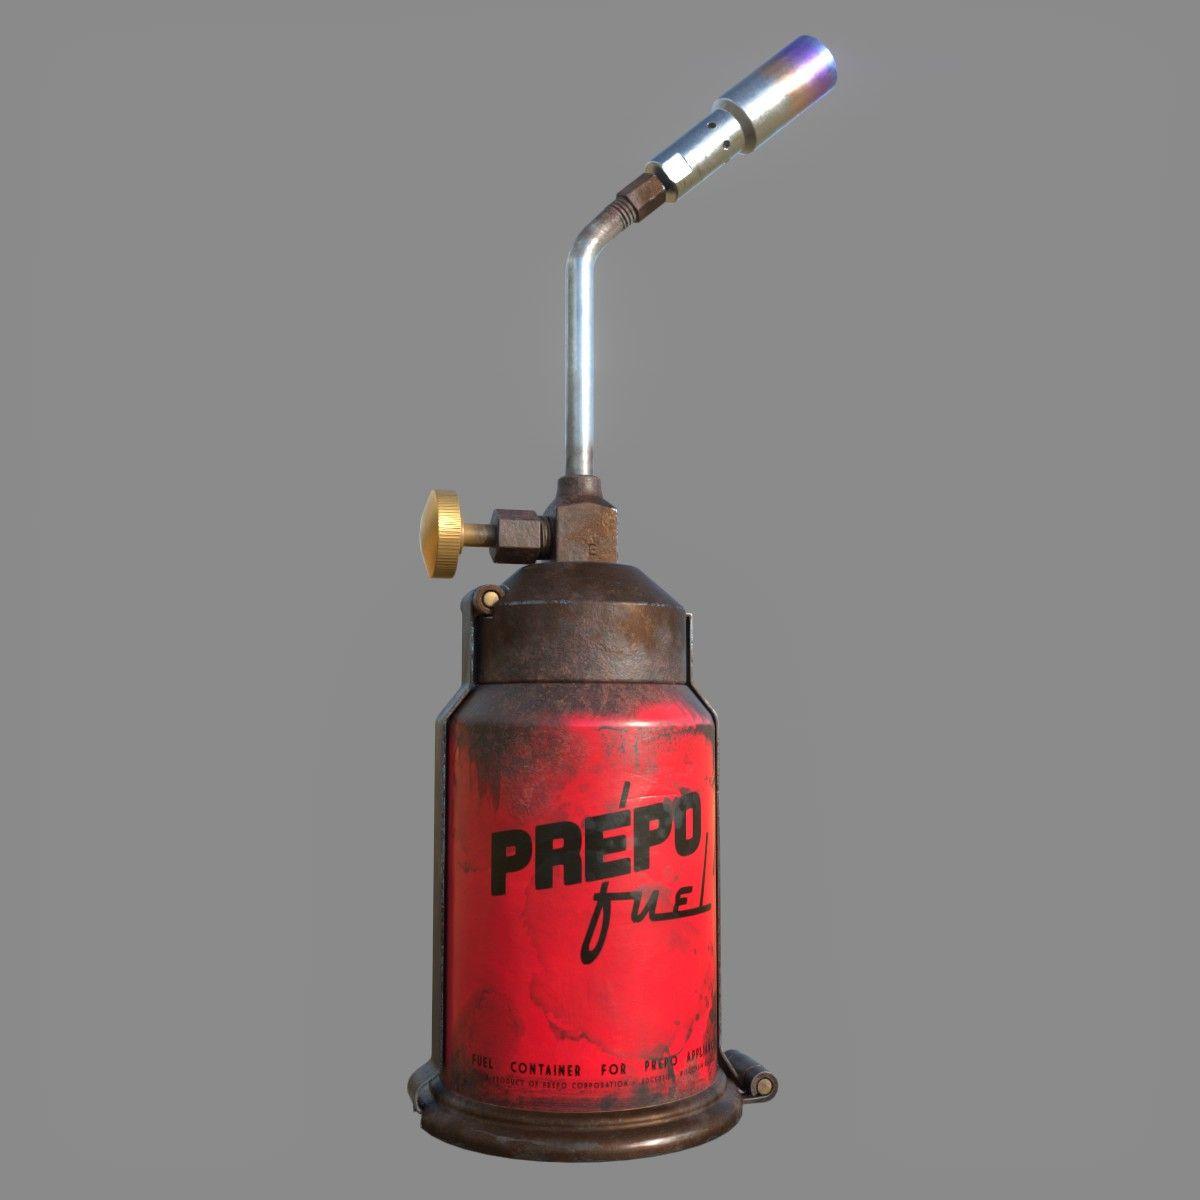 Prepo Fuel Blow Torch|Autodesk Online Gallery